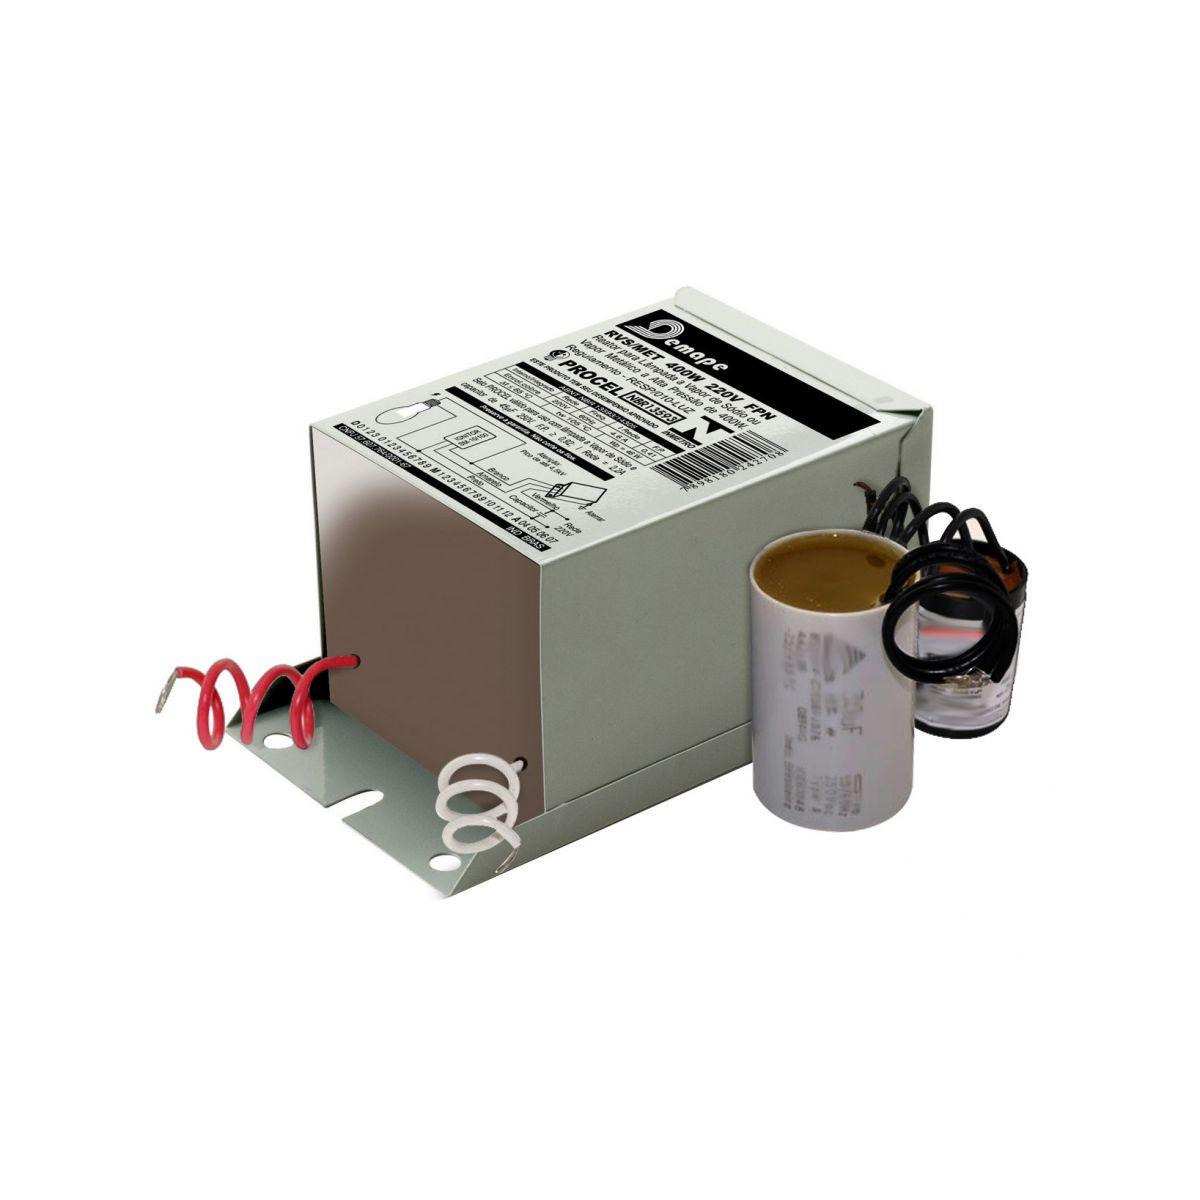 Reator 1000W Vapor Sódio - Uso Interno - 220V (Acende todas as marcas)